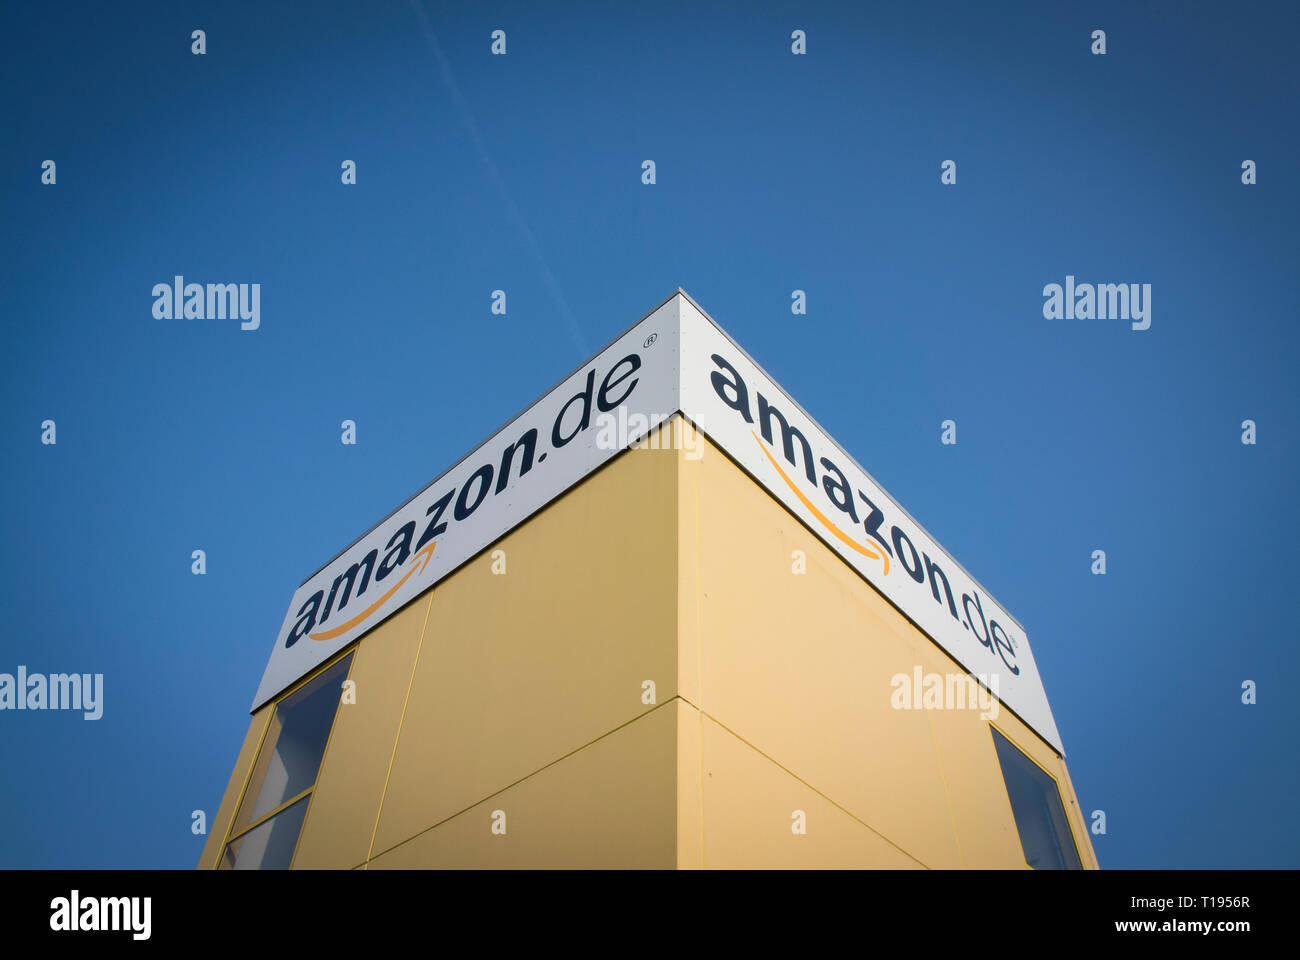 Amazon's distribution centre in Leipzig, Germany. - Stock Image